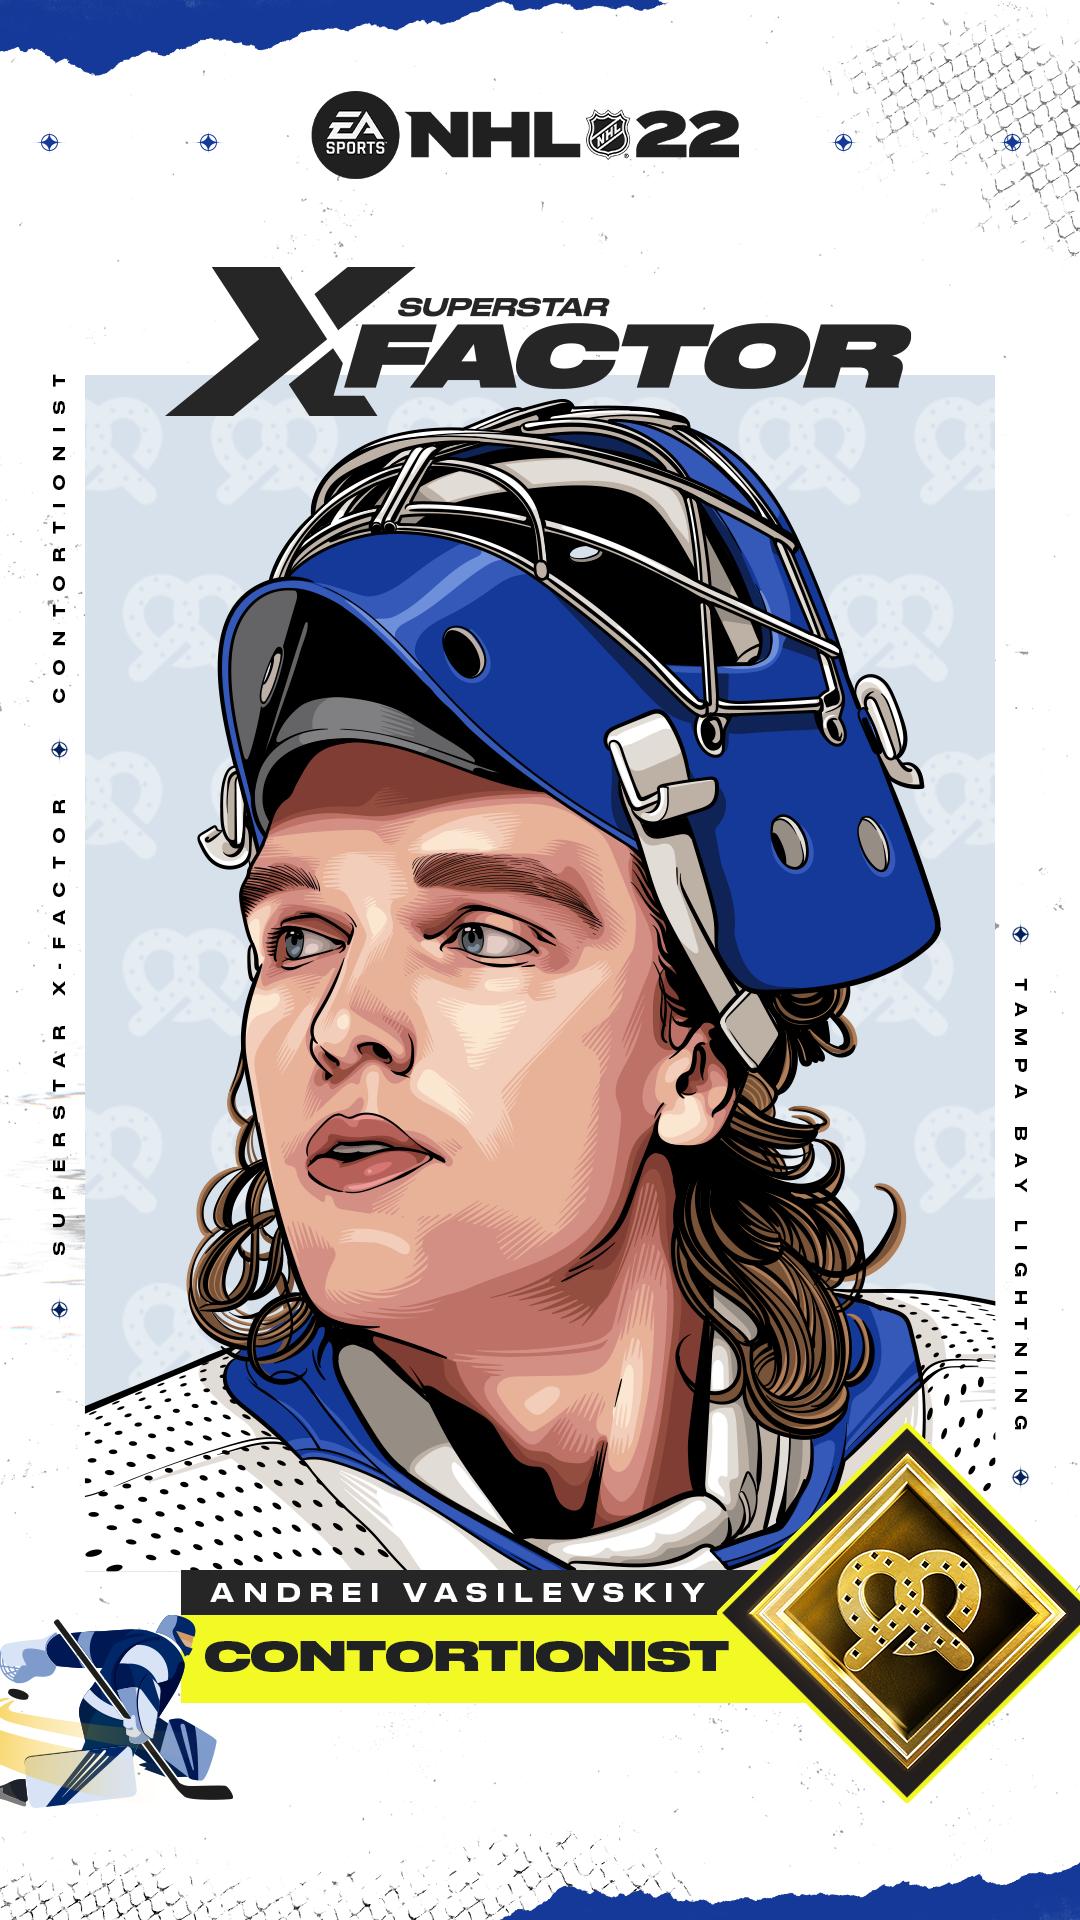 NHL22_XFactor_AndreiVasilevskiy_9x16